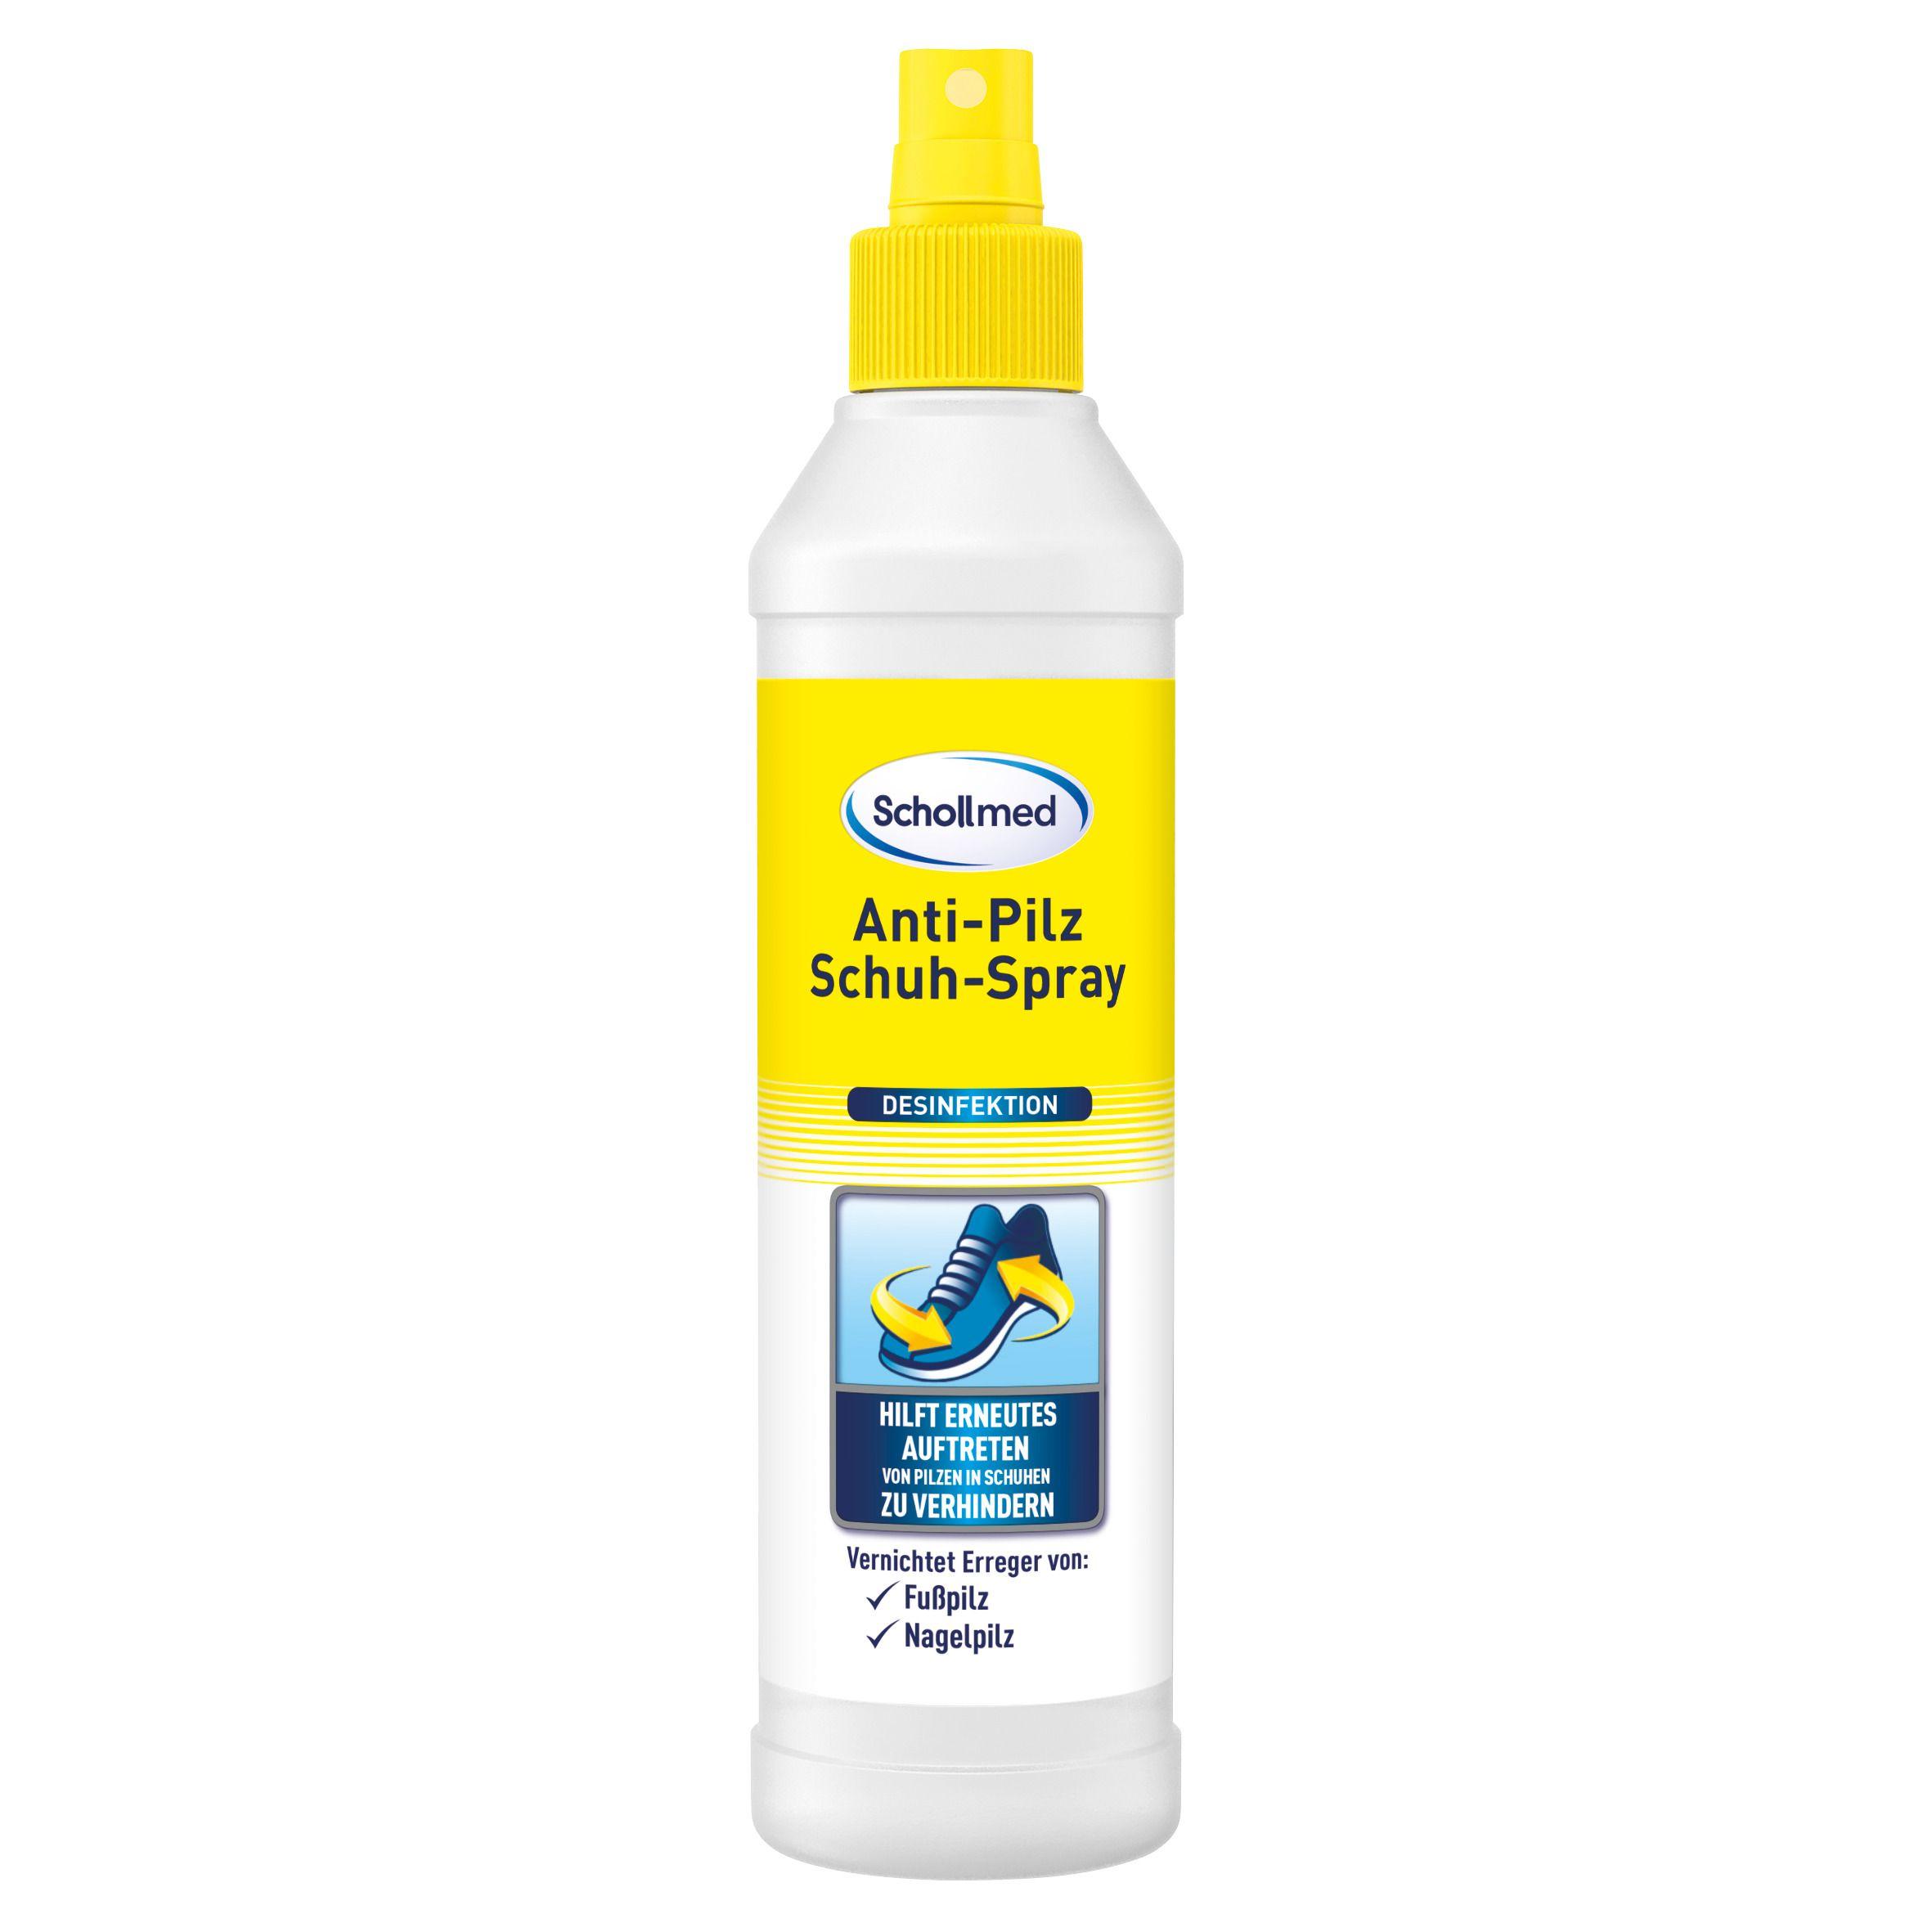 Schollmed Anti Pilz Schuh Spray 250 ml shop